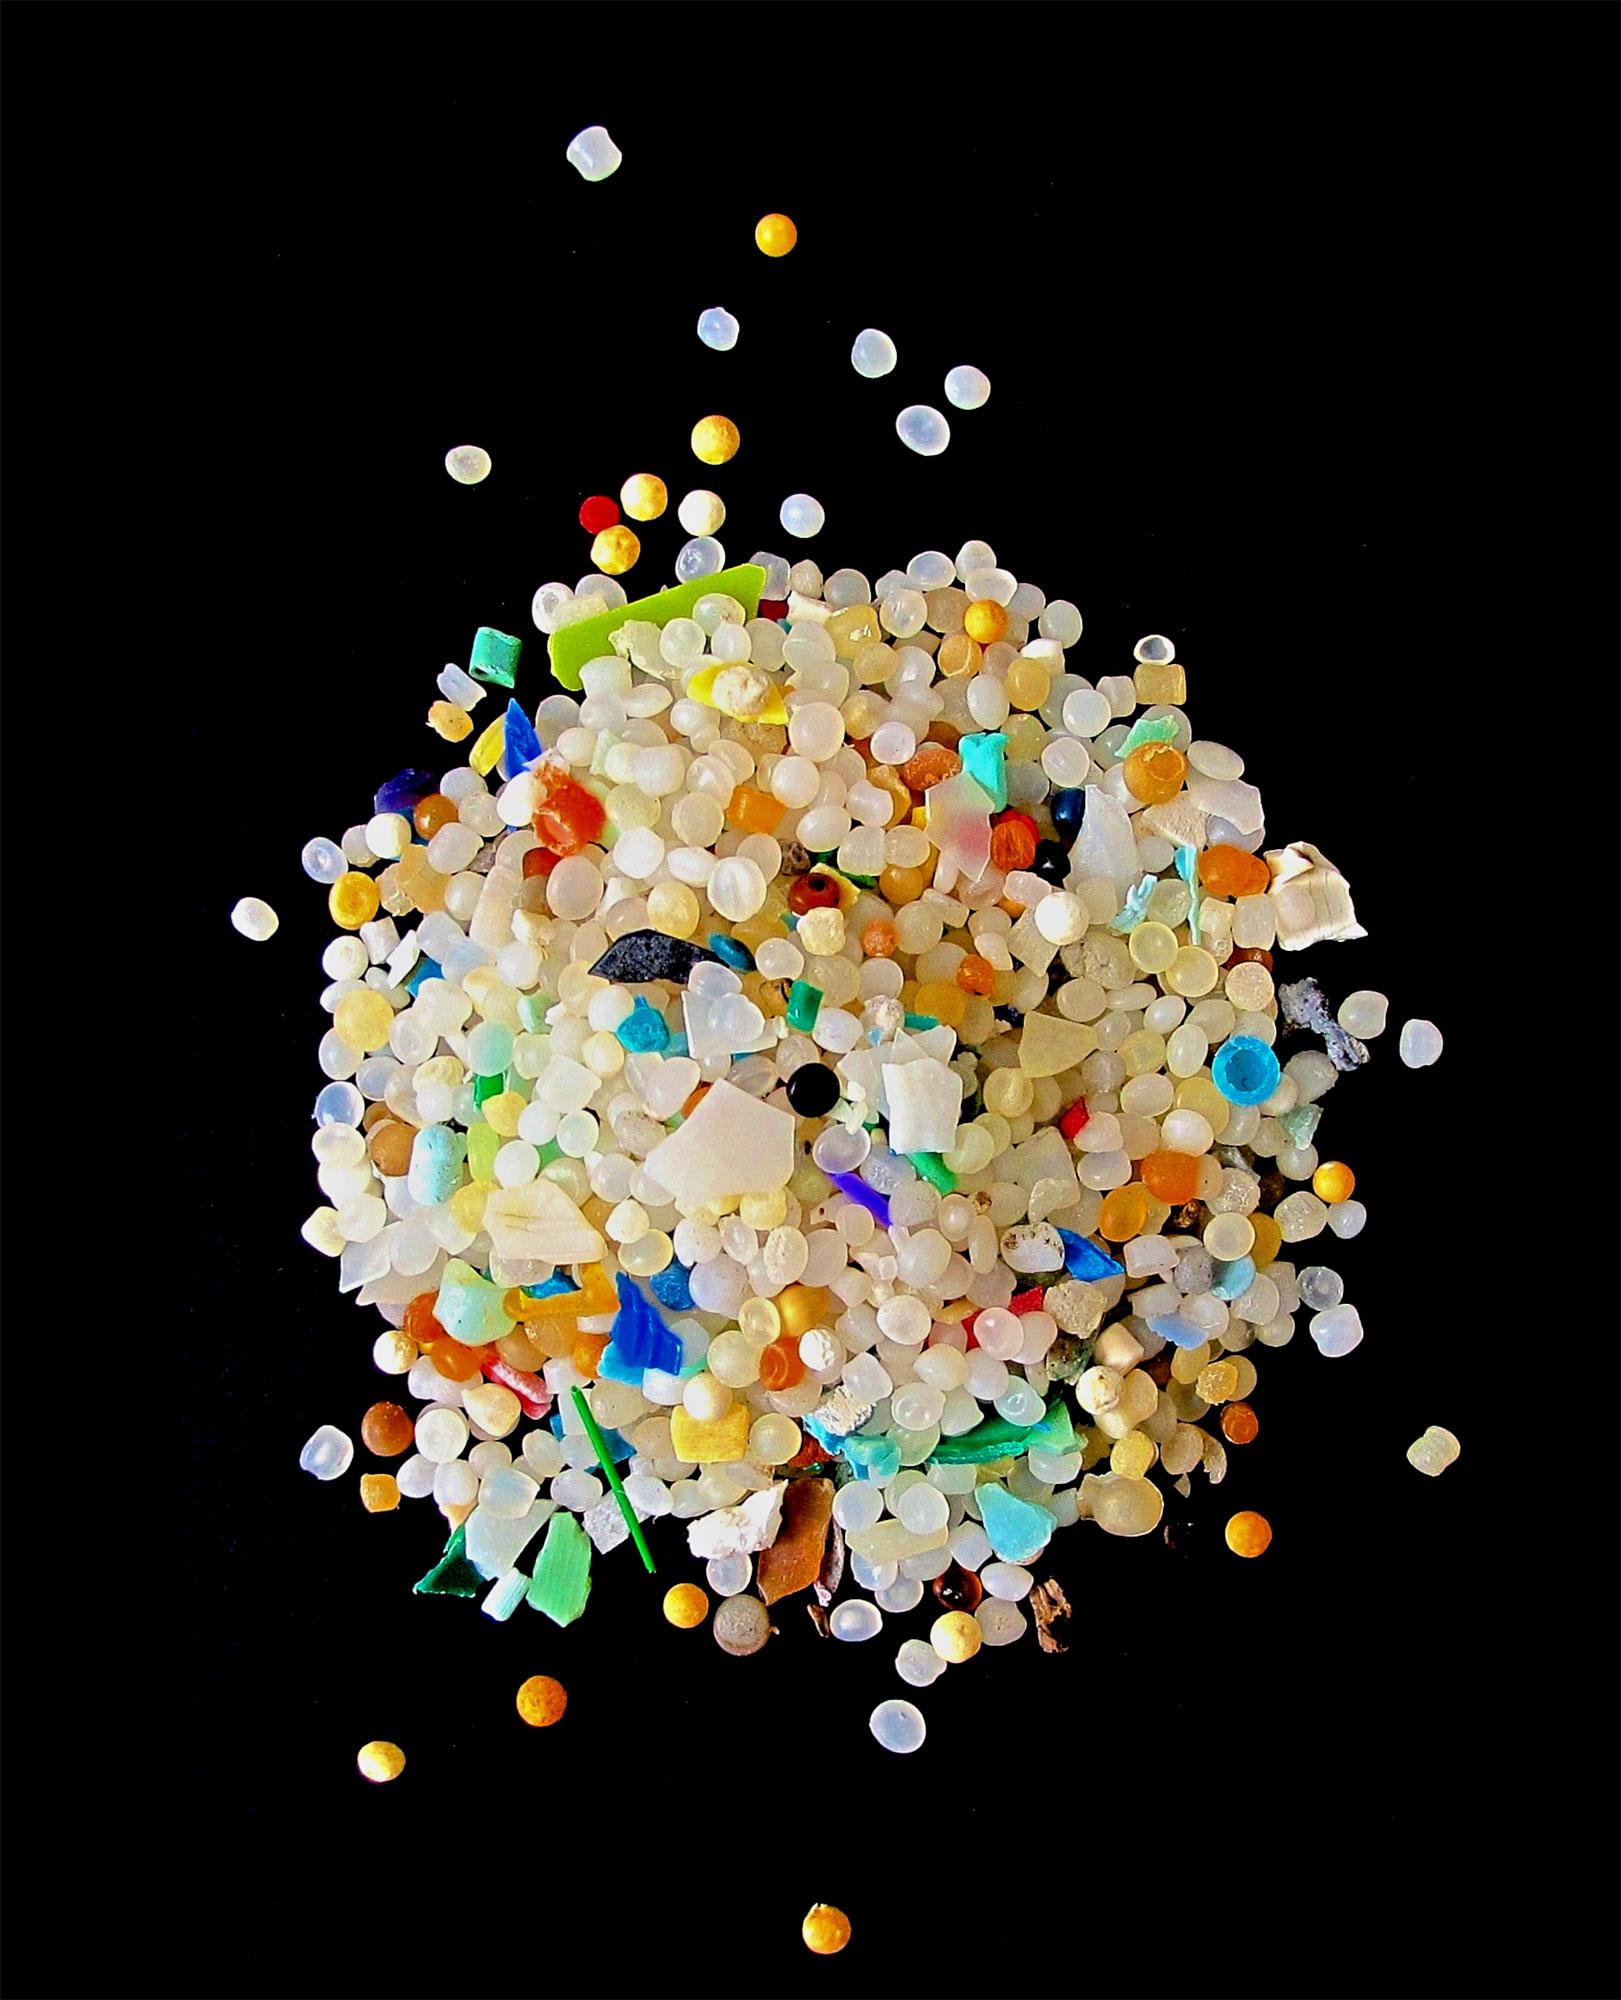 Microplastics make marine worms sick